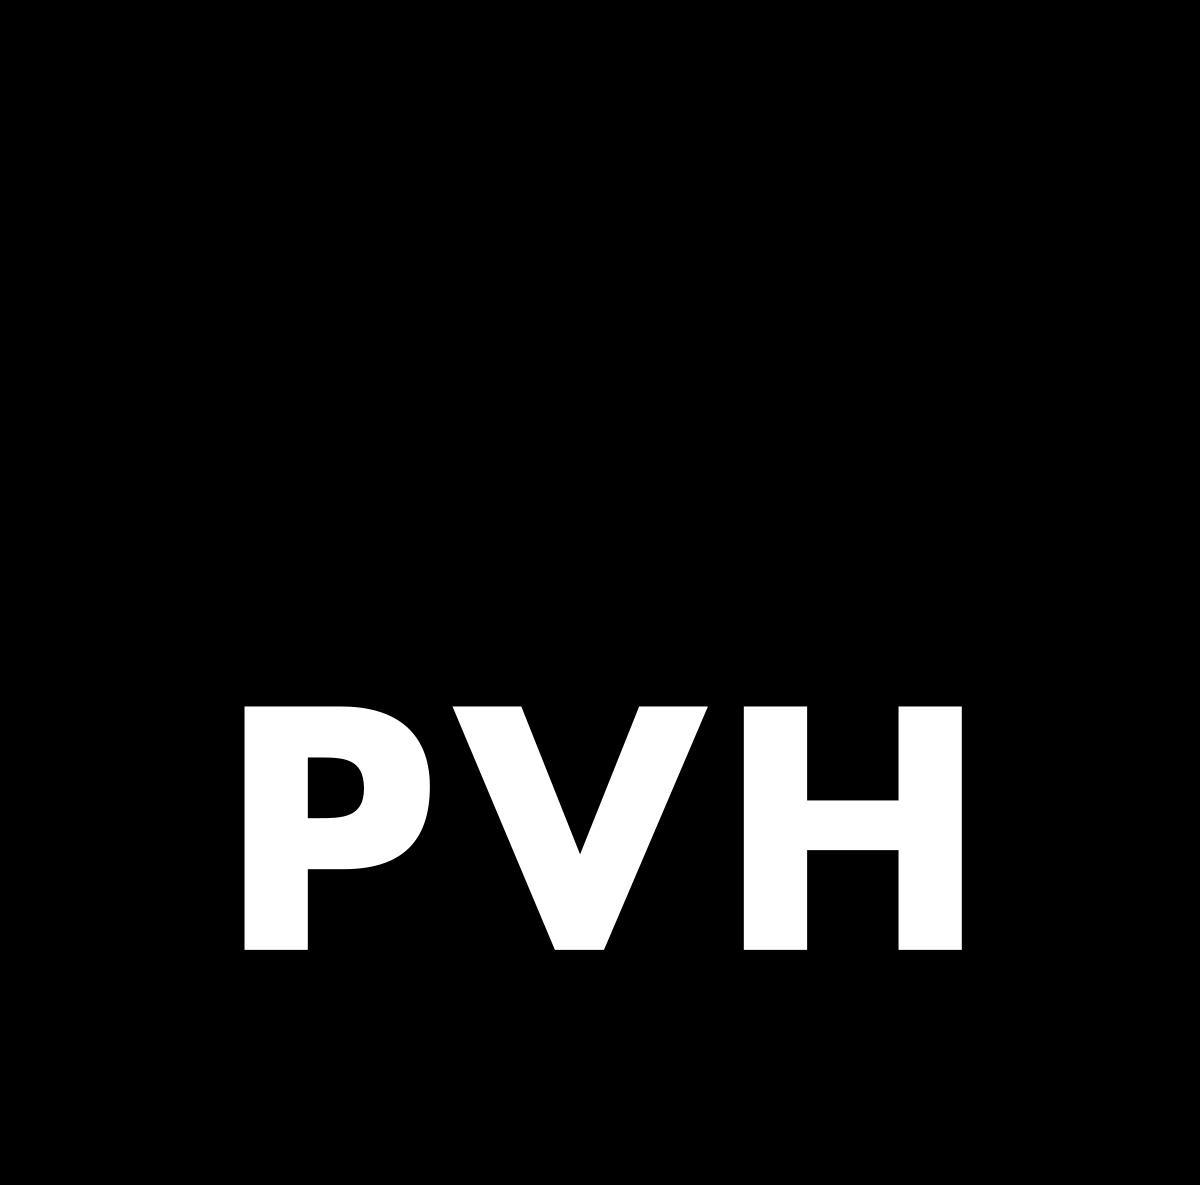 pvh.png